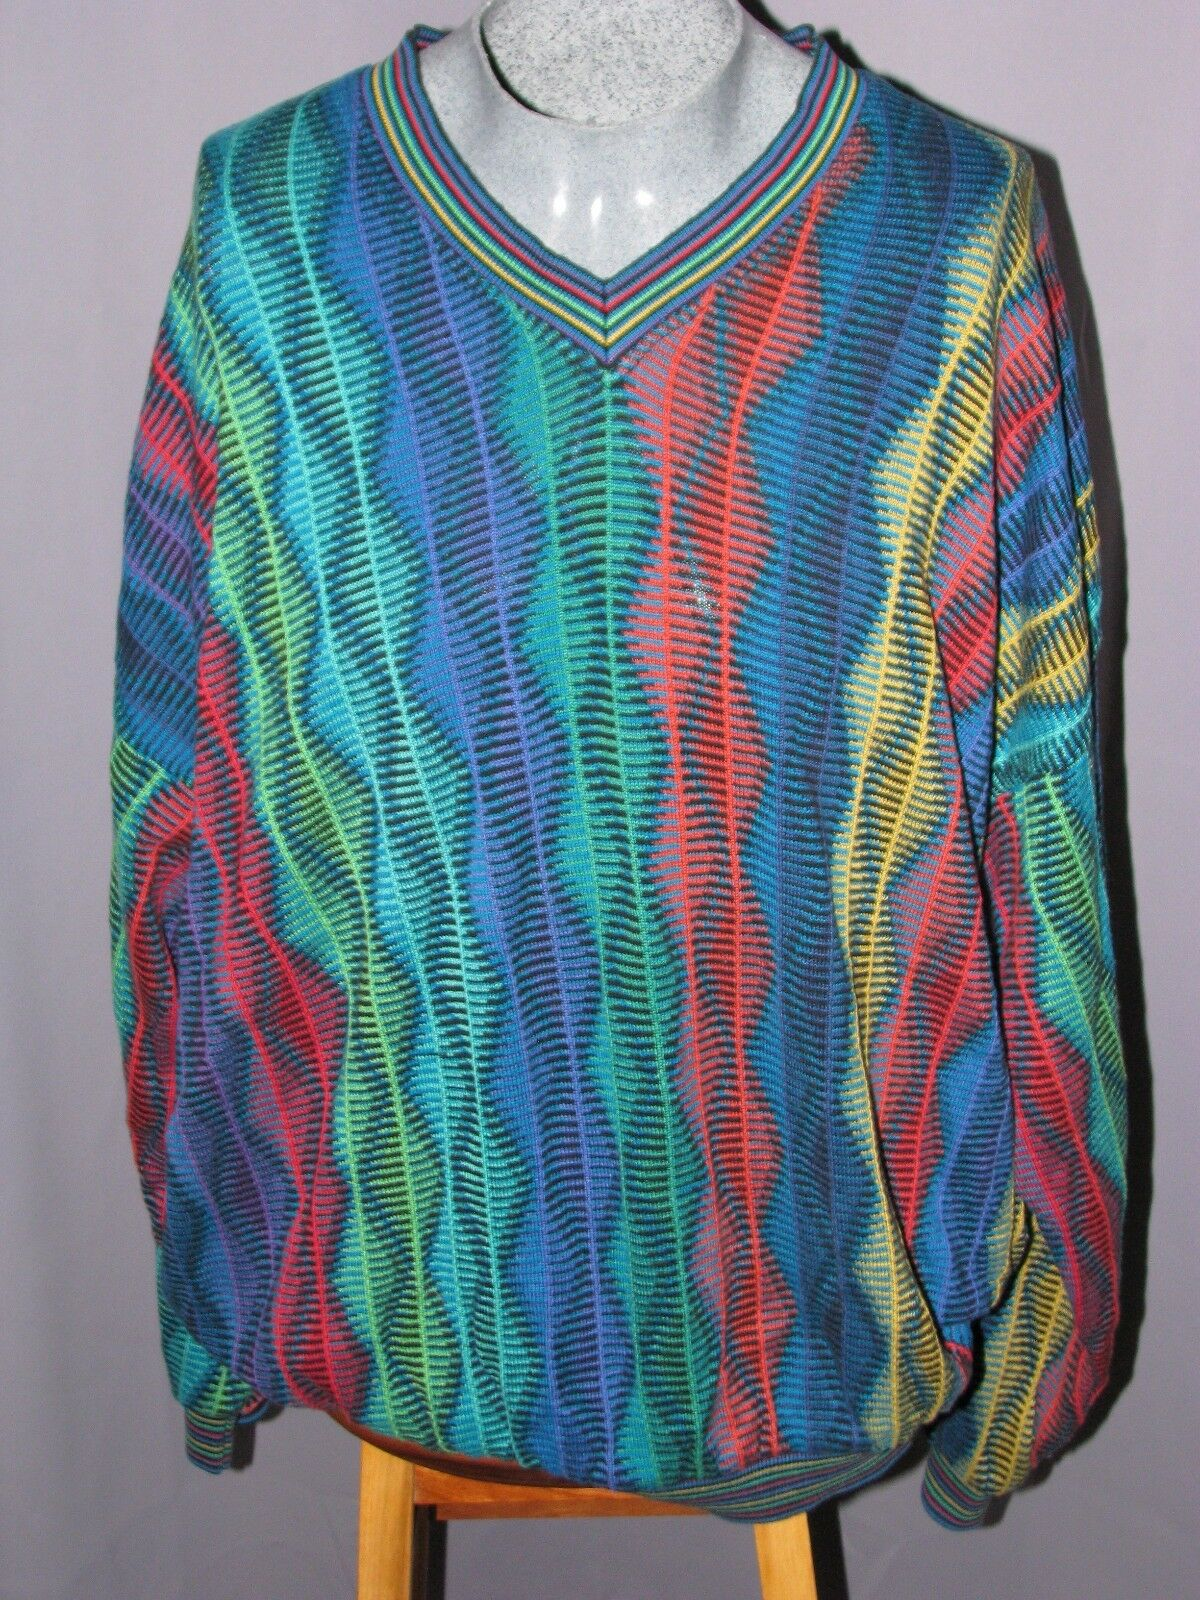 Mens L Tundra Knit Cosby Vtg Sweater 100% Mercerized Cotton colorful Street Wear